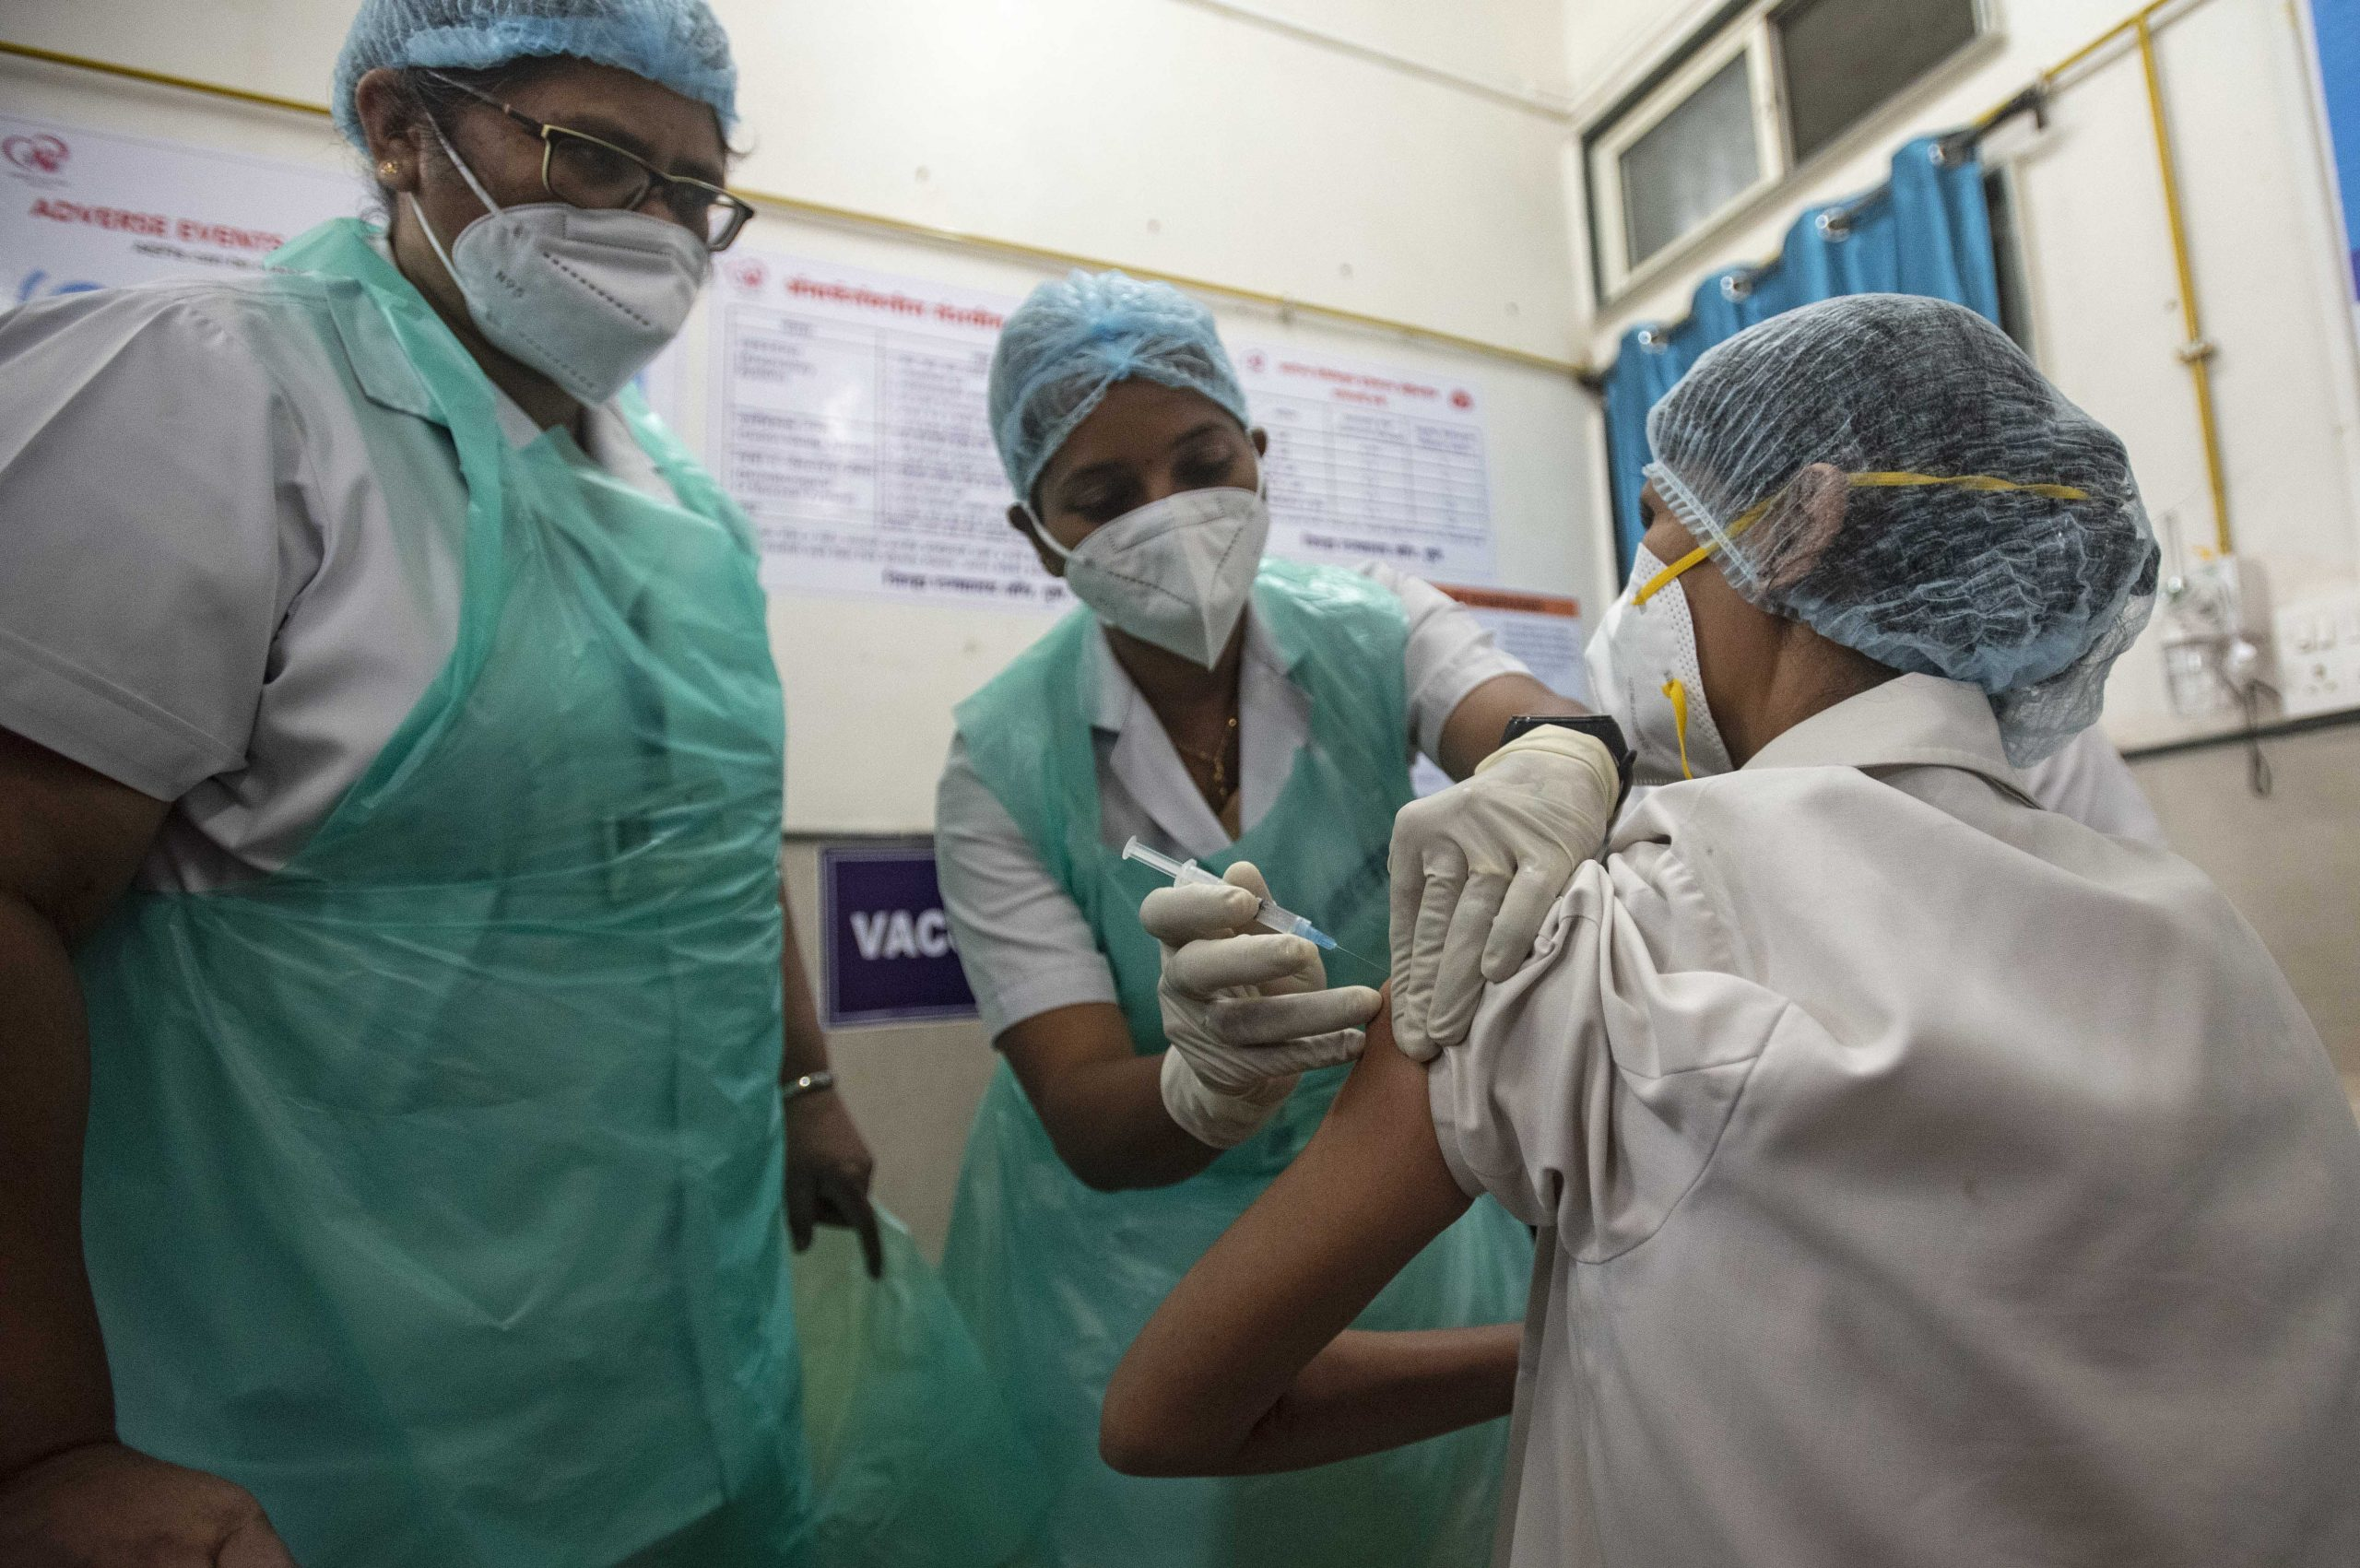 india-covid-19-cases-rise-vaccination-accelerates